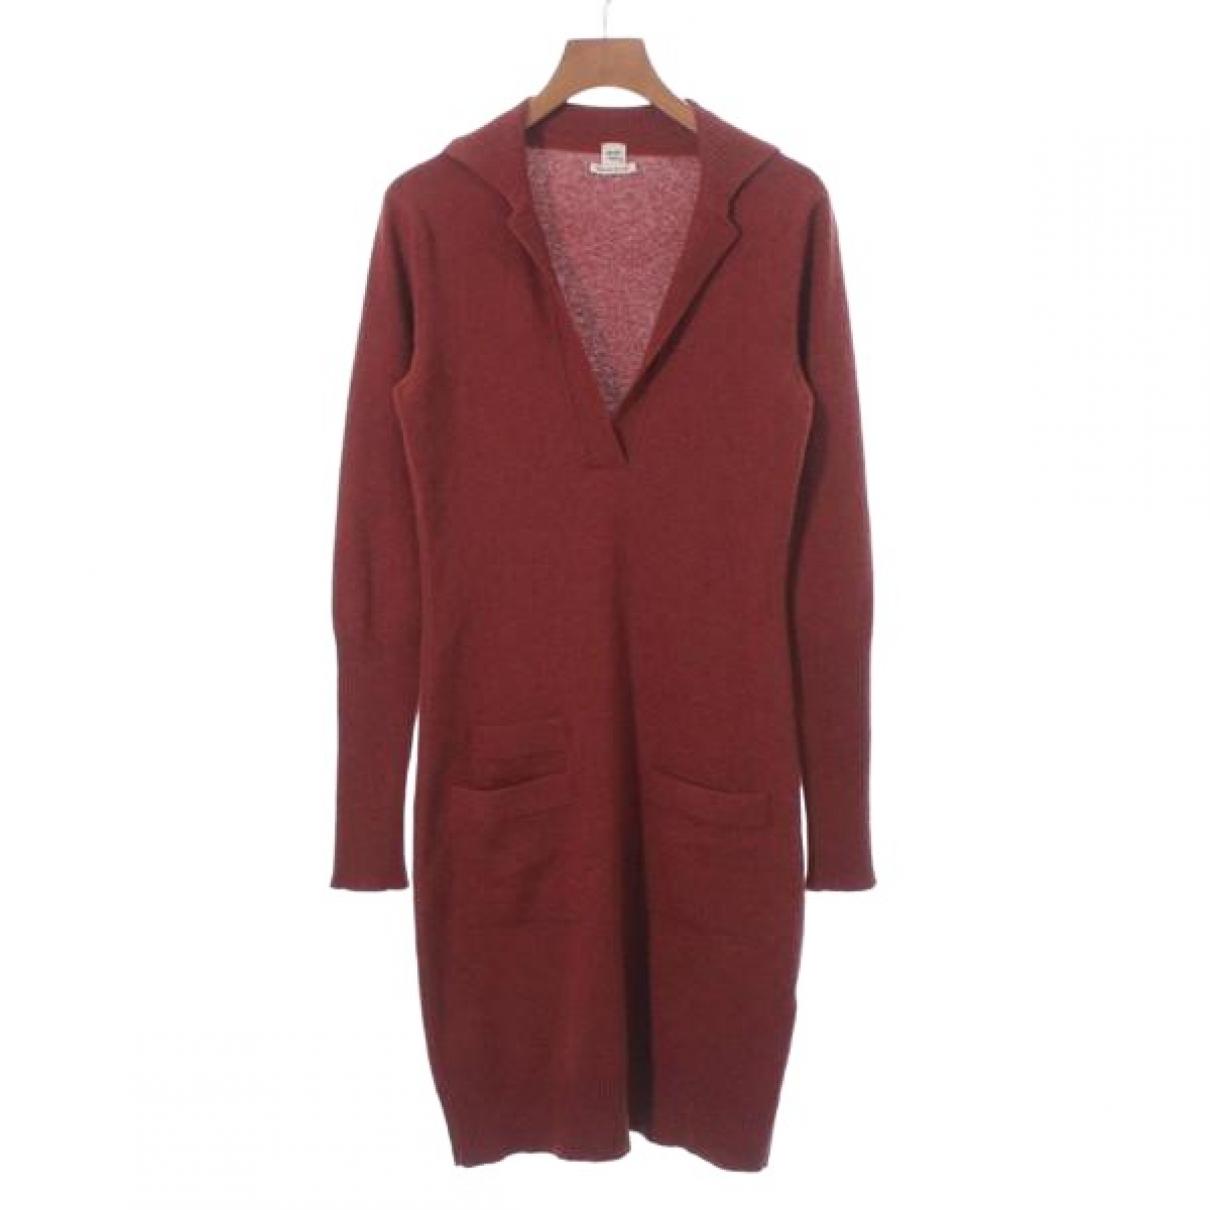 Hermès \N Orange Cashmere dress for Women 36 FR